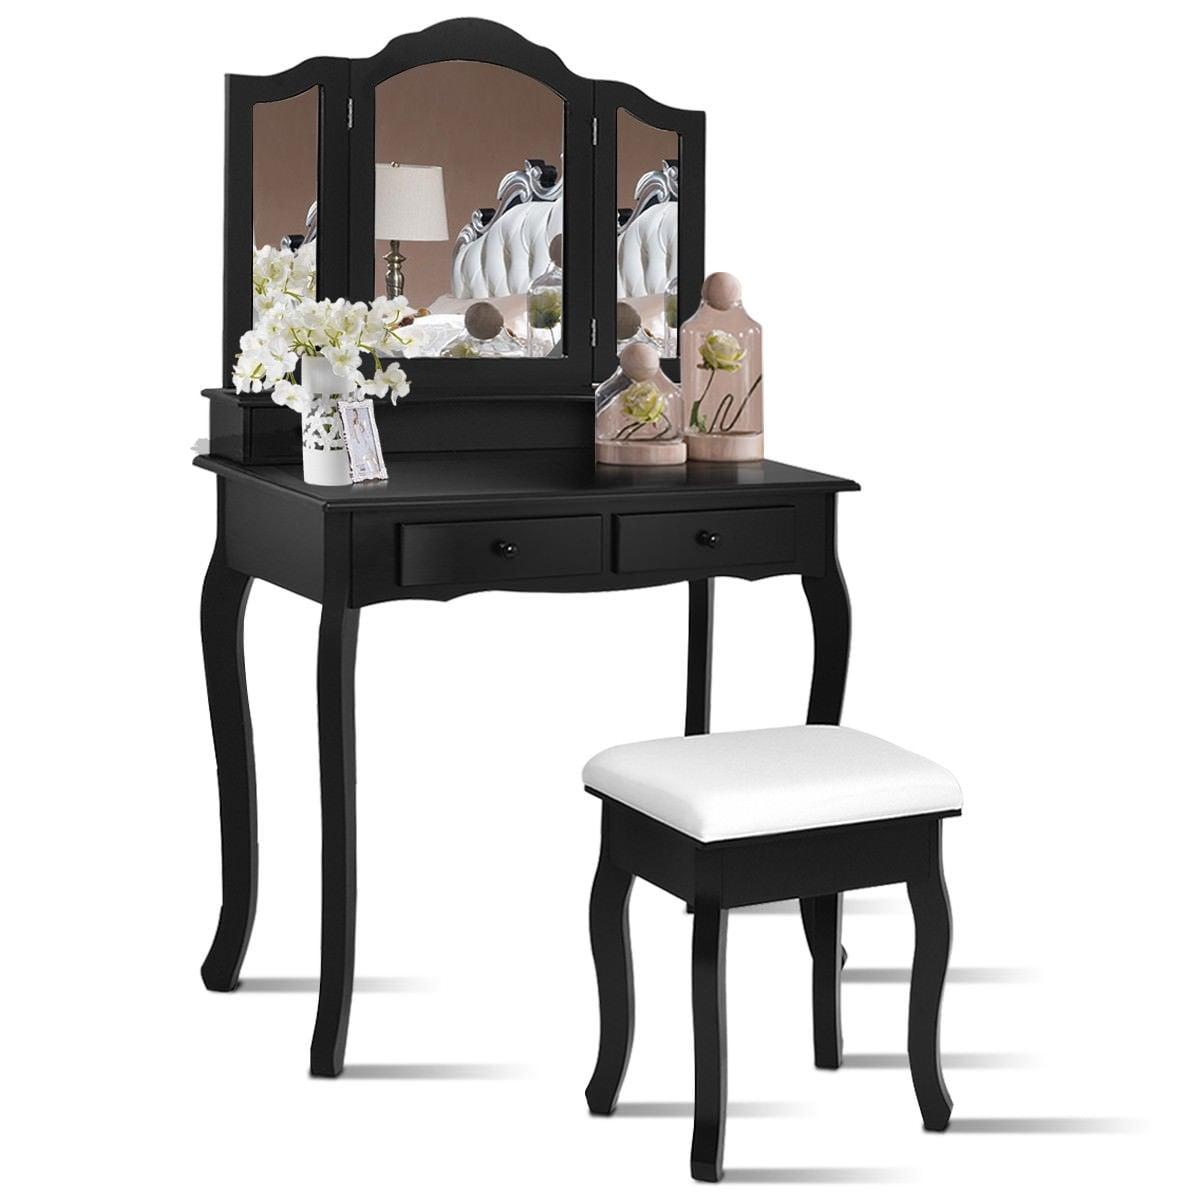 Shop Costway Vanity Makeup Dressing Table Set Bathroom W/Stool 4  Draweru0026Mirror Jewelry Wood Desk Black   Free Shipping Today   Overstock.com    18621886